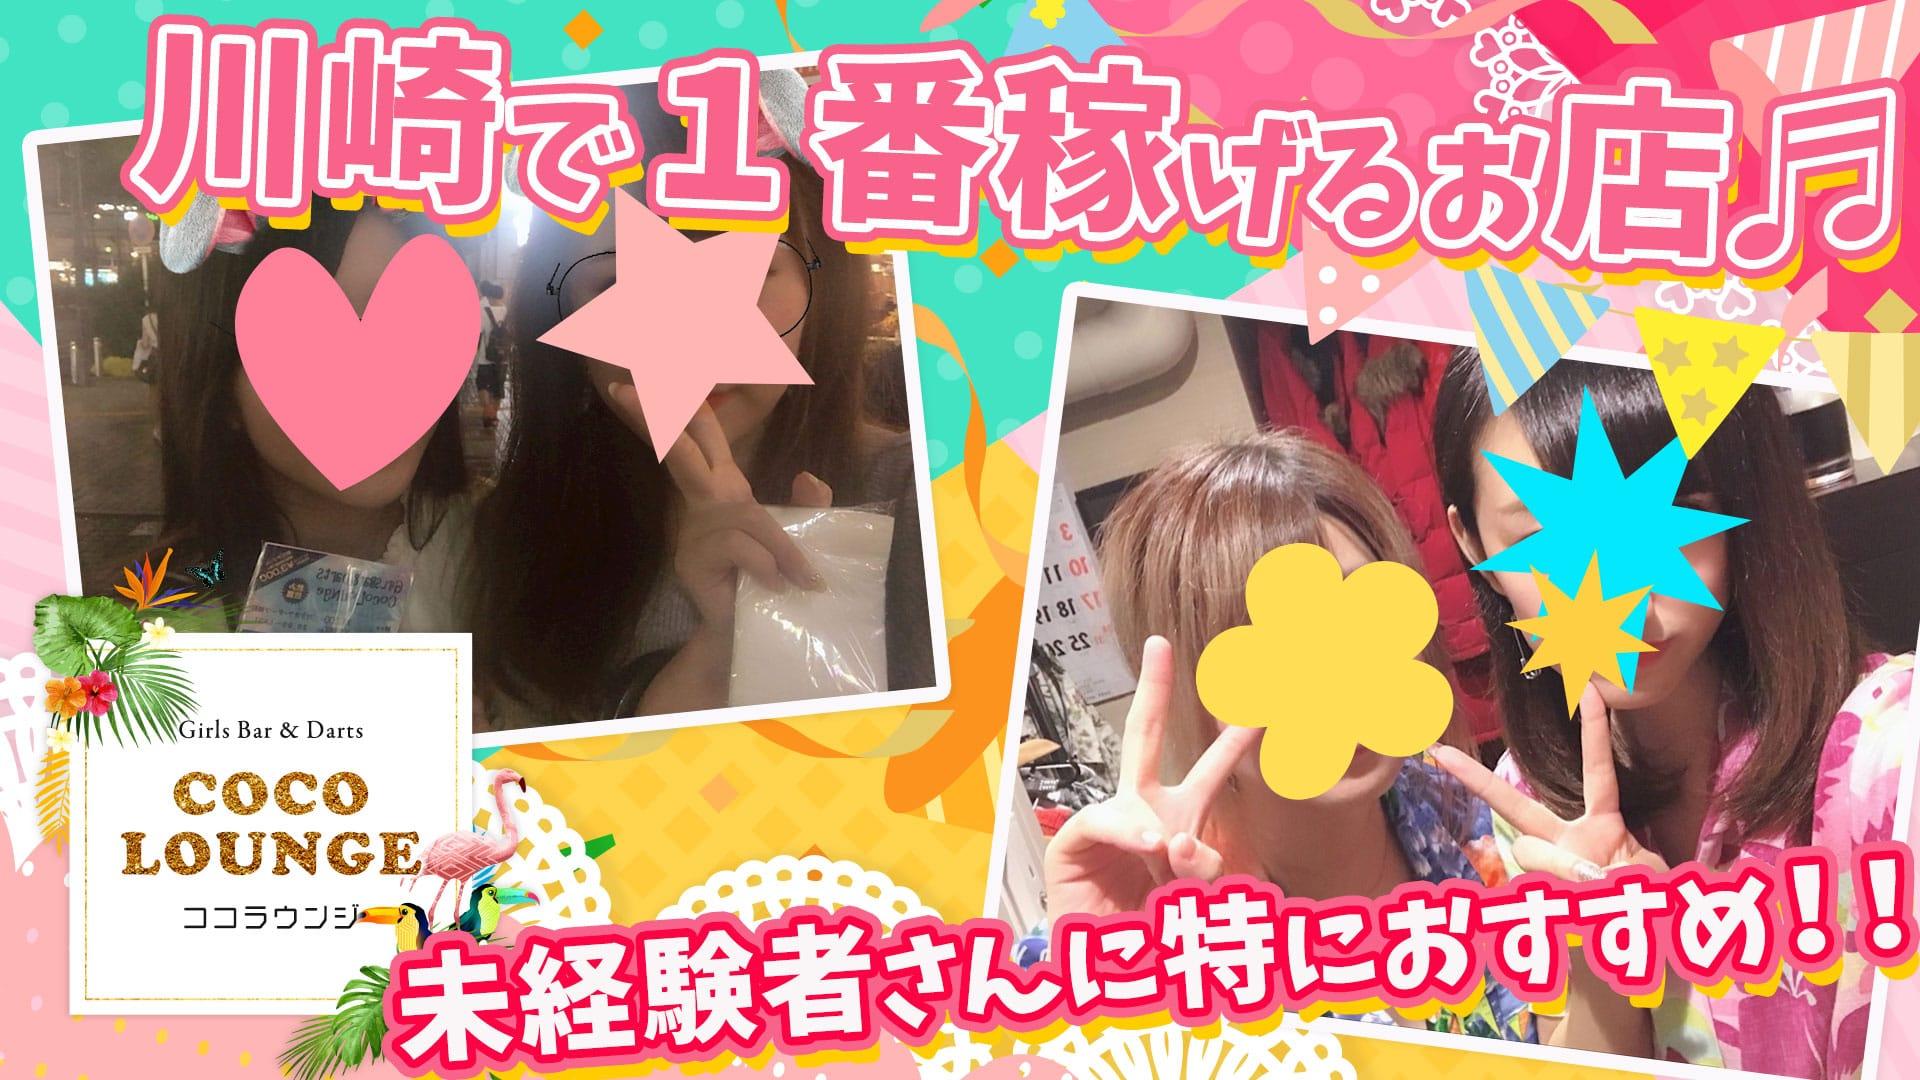 Girls Bar&Darts ~ココラウンジ~ 川崎ガールズバー TOP画像